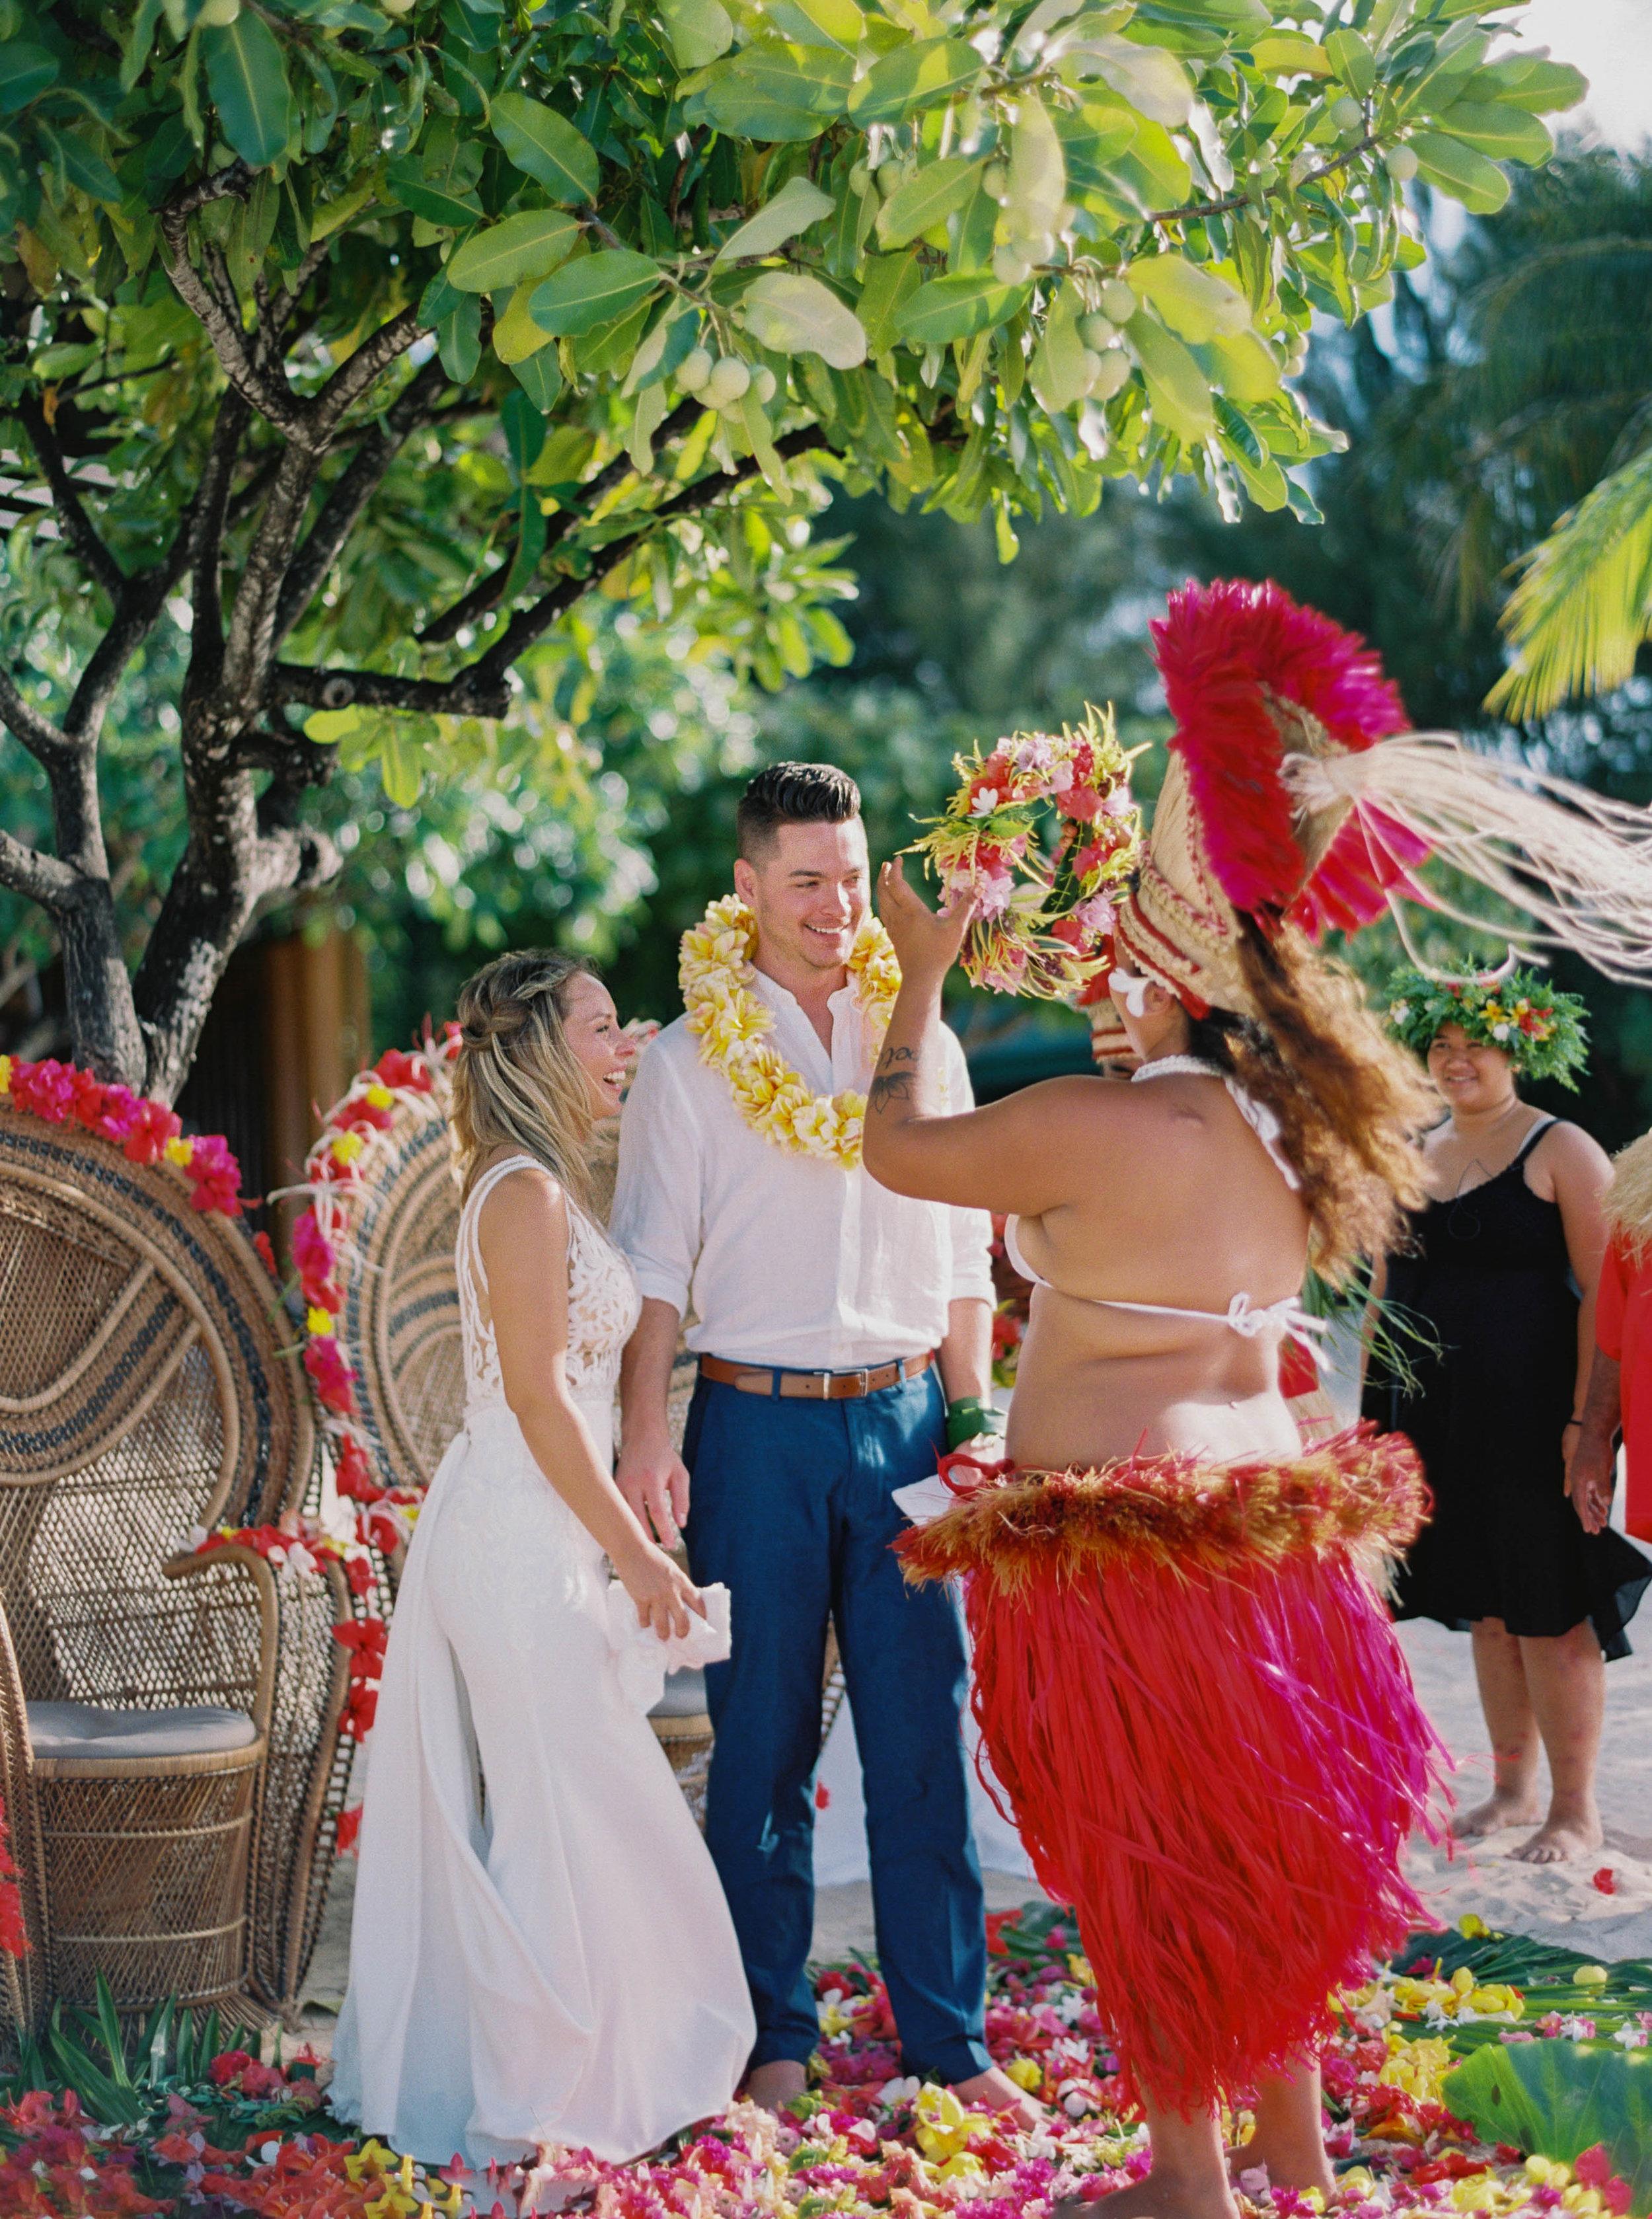 Moorea_Wedding_Elopement_Photographer_Videographer_097.jpg